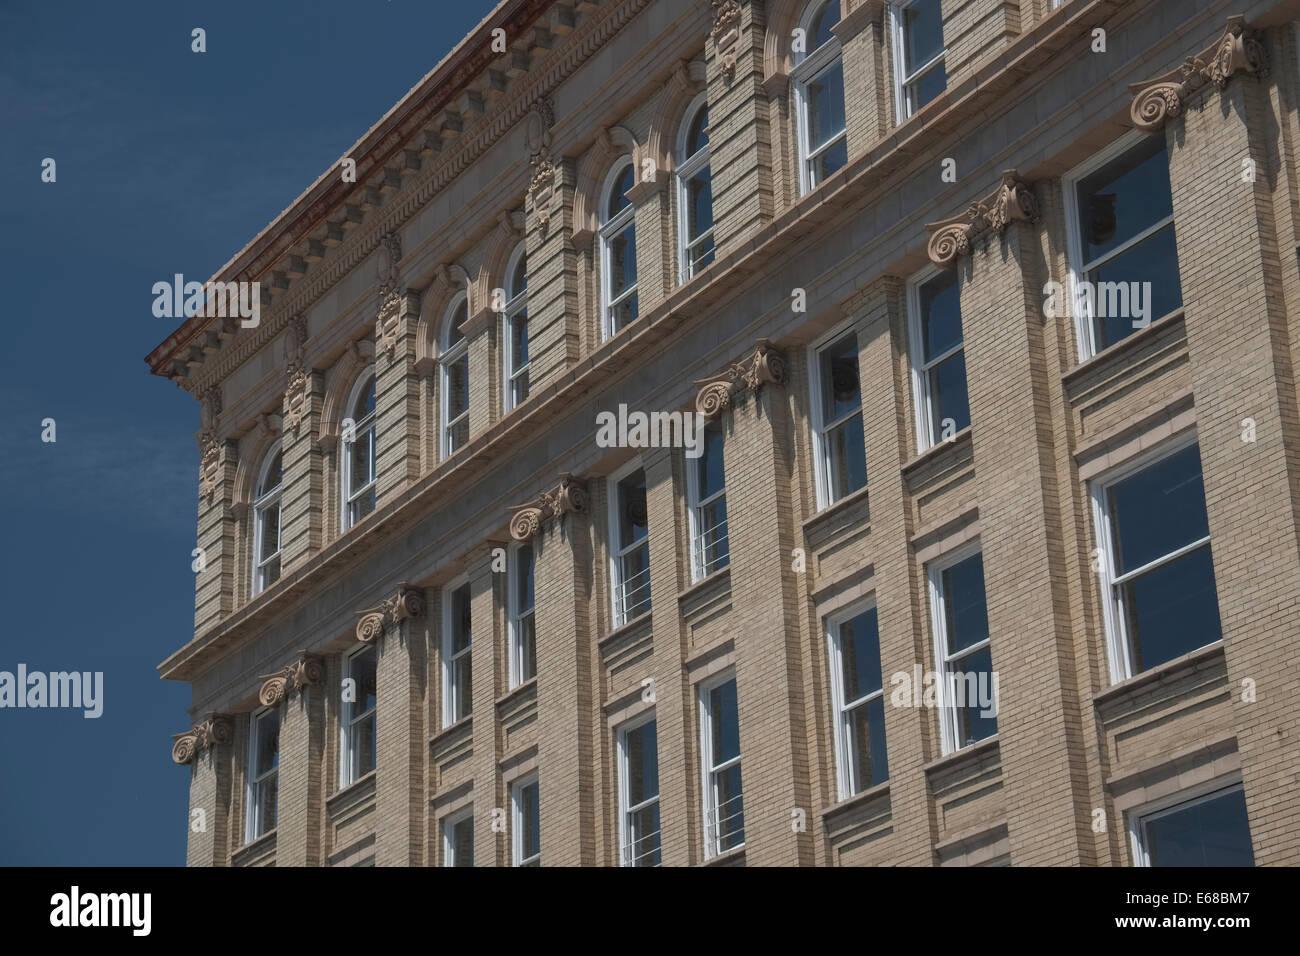 New Bern, Carolina del Norte, la arquitectura. Pollock St Imagen De Stock